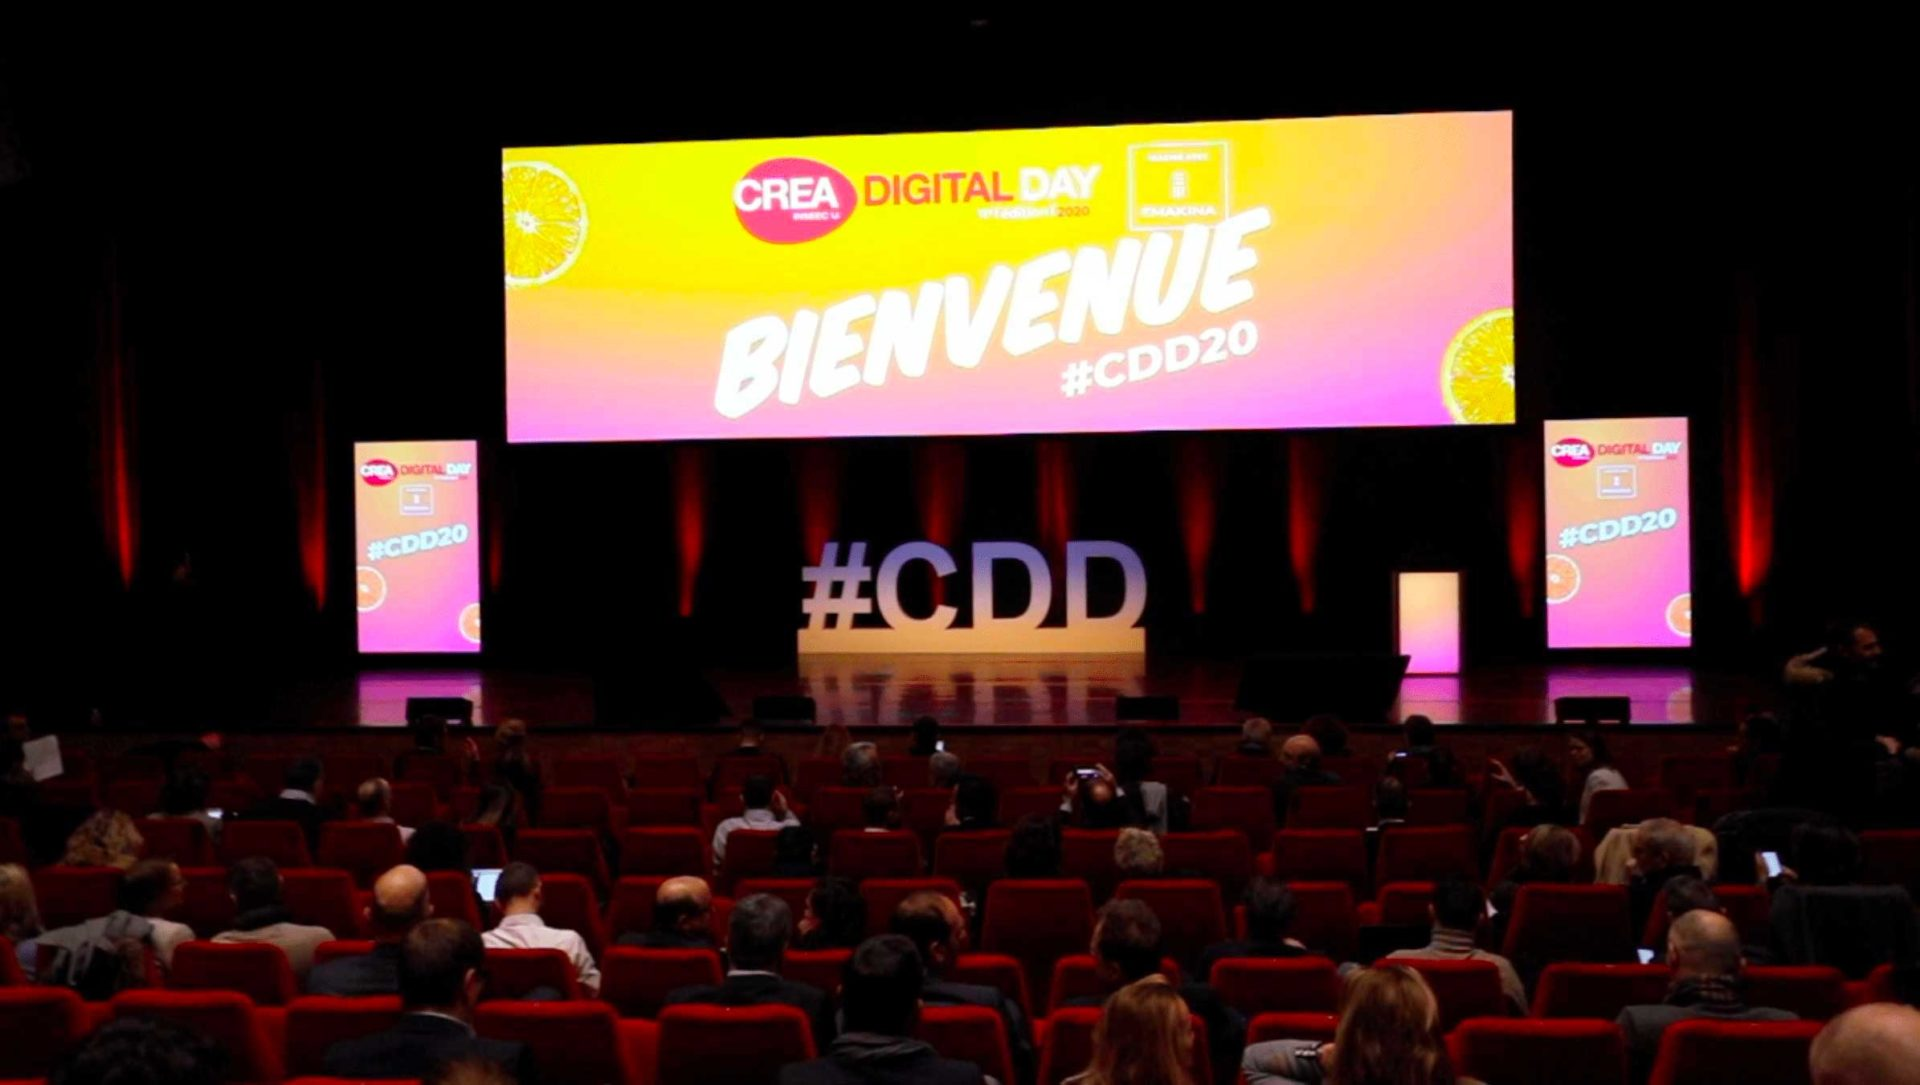 Crea digital day evenementiel